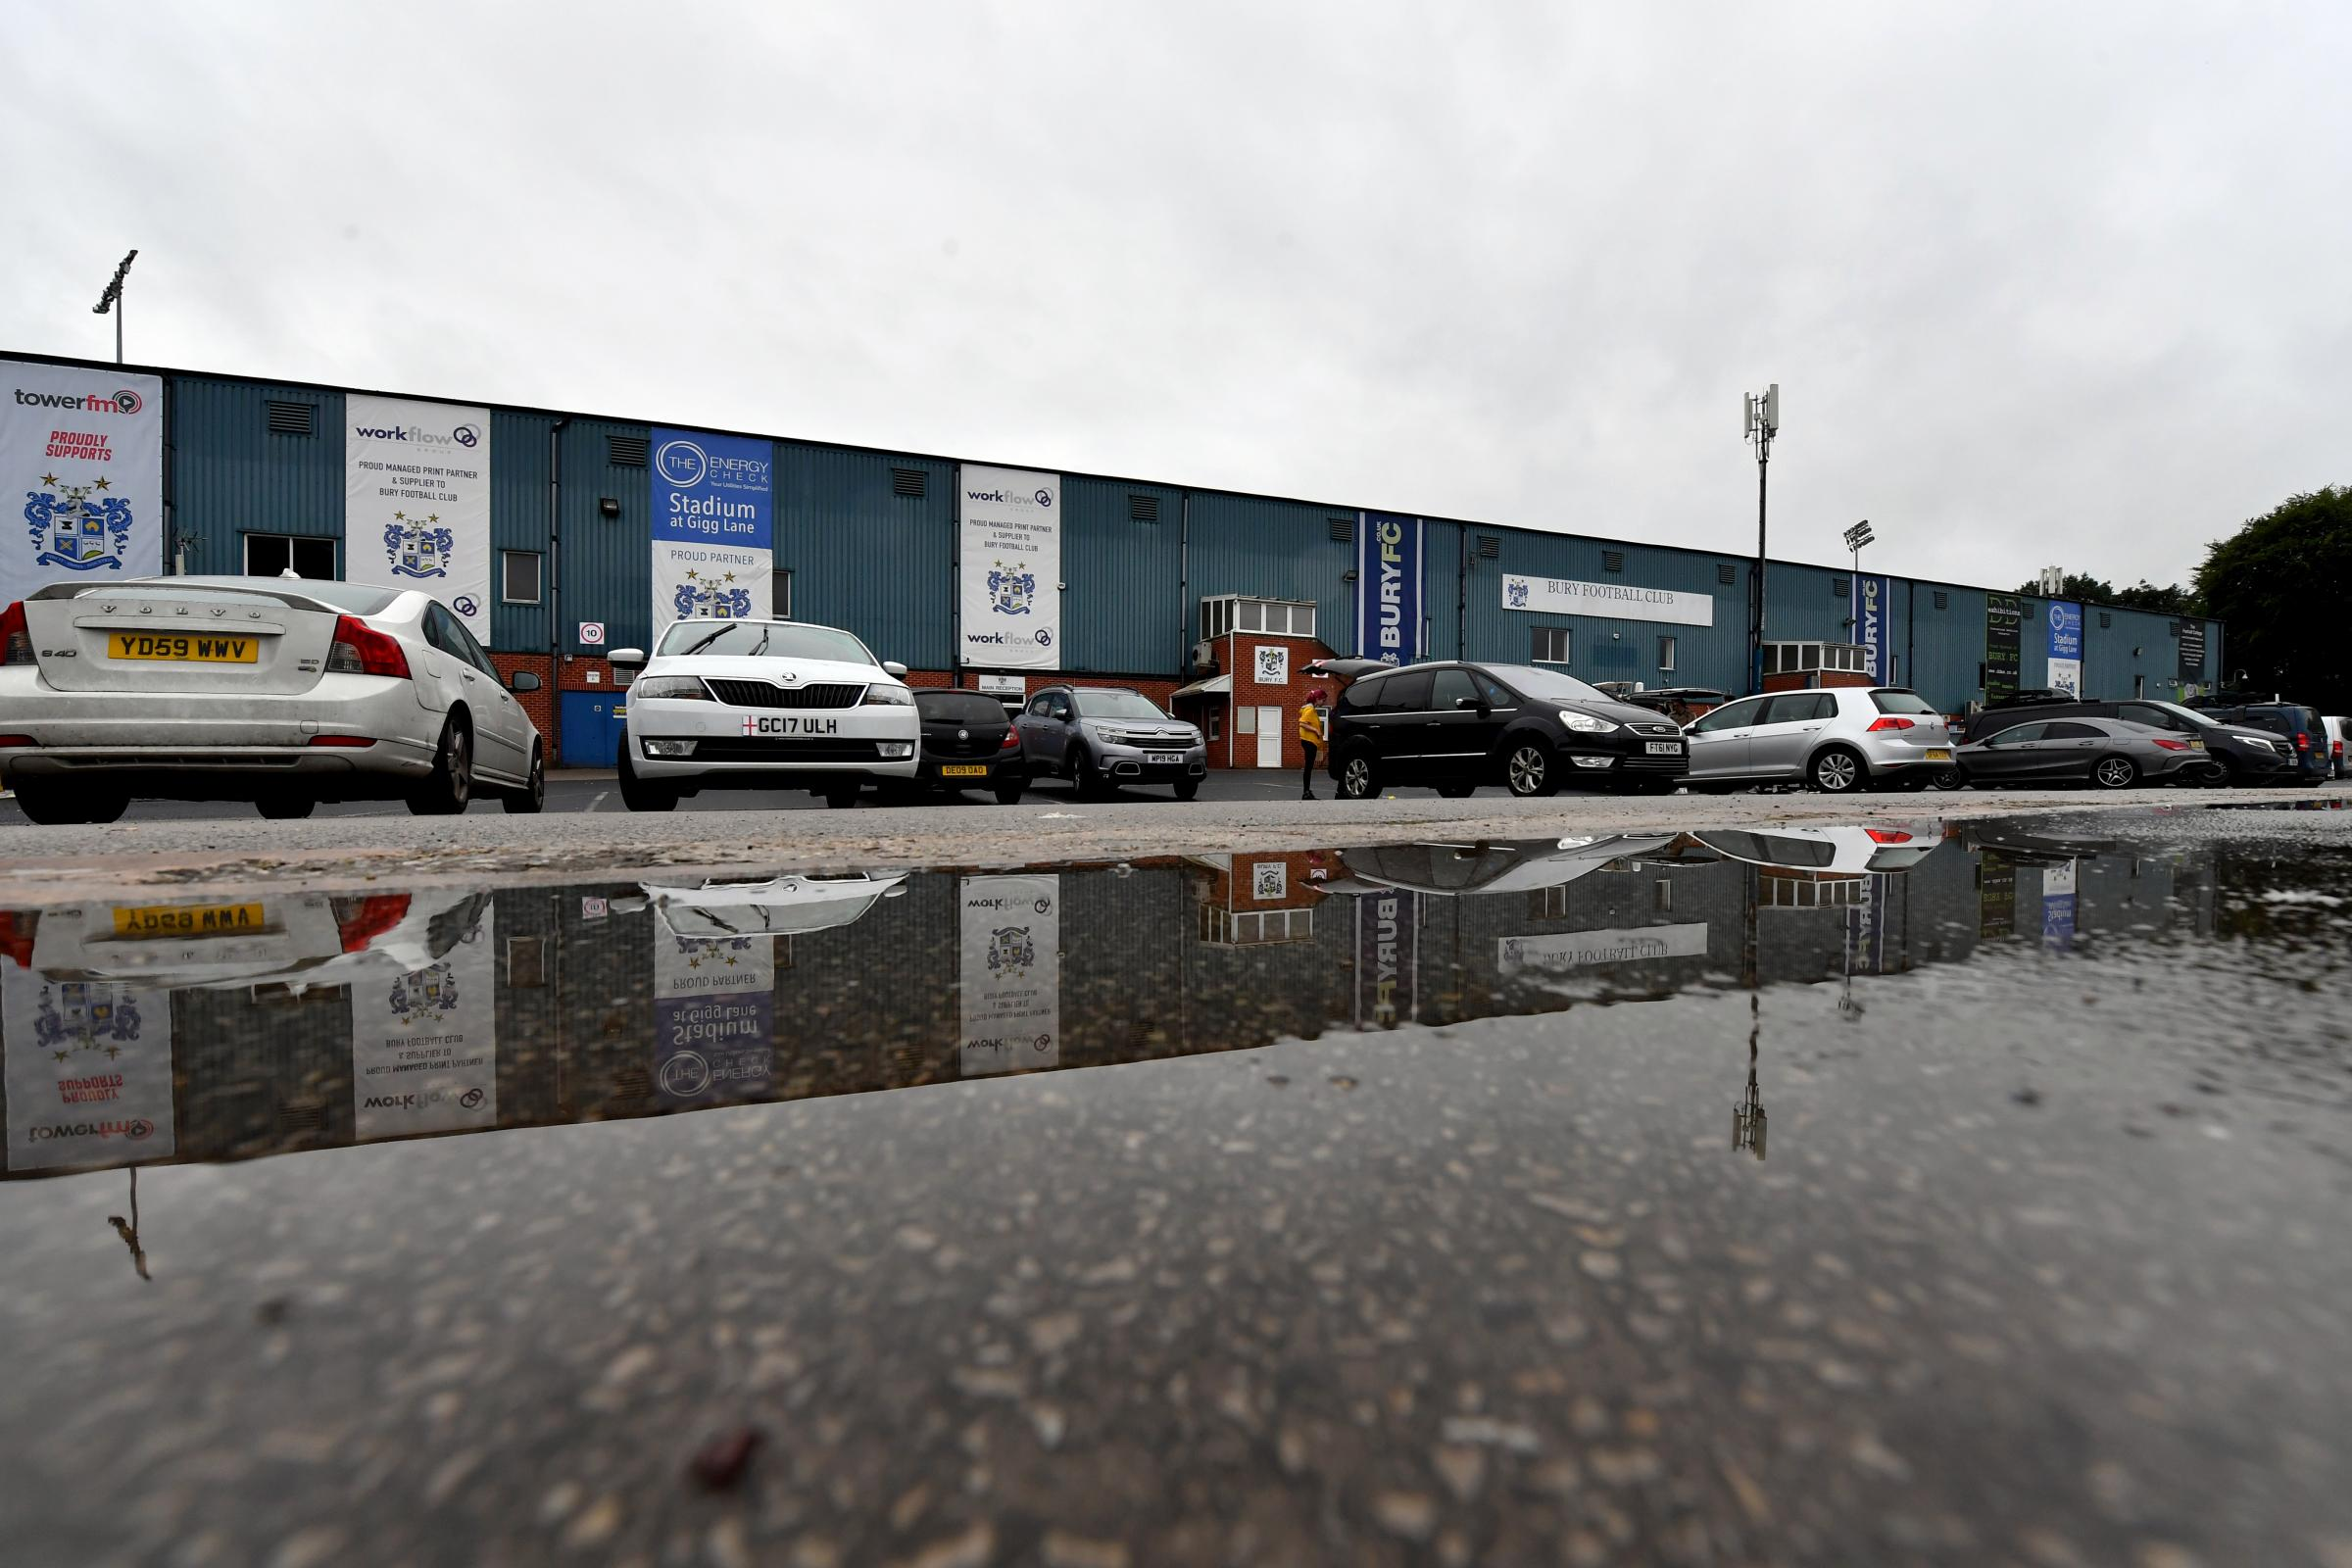 Bury FC owner Steve Dale tries for new debt deal